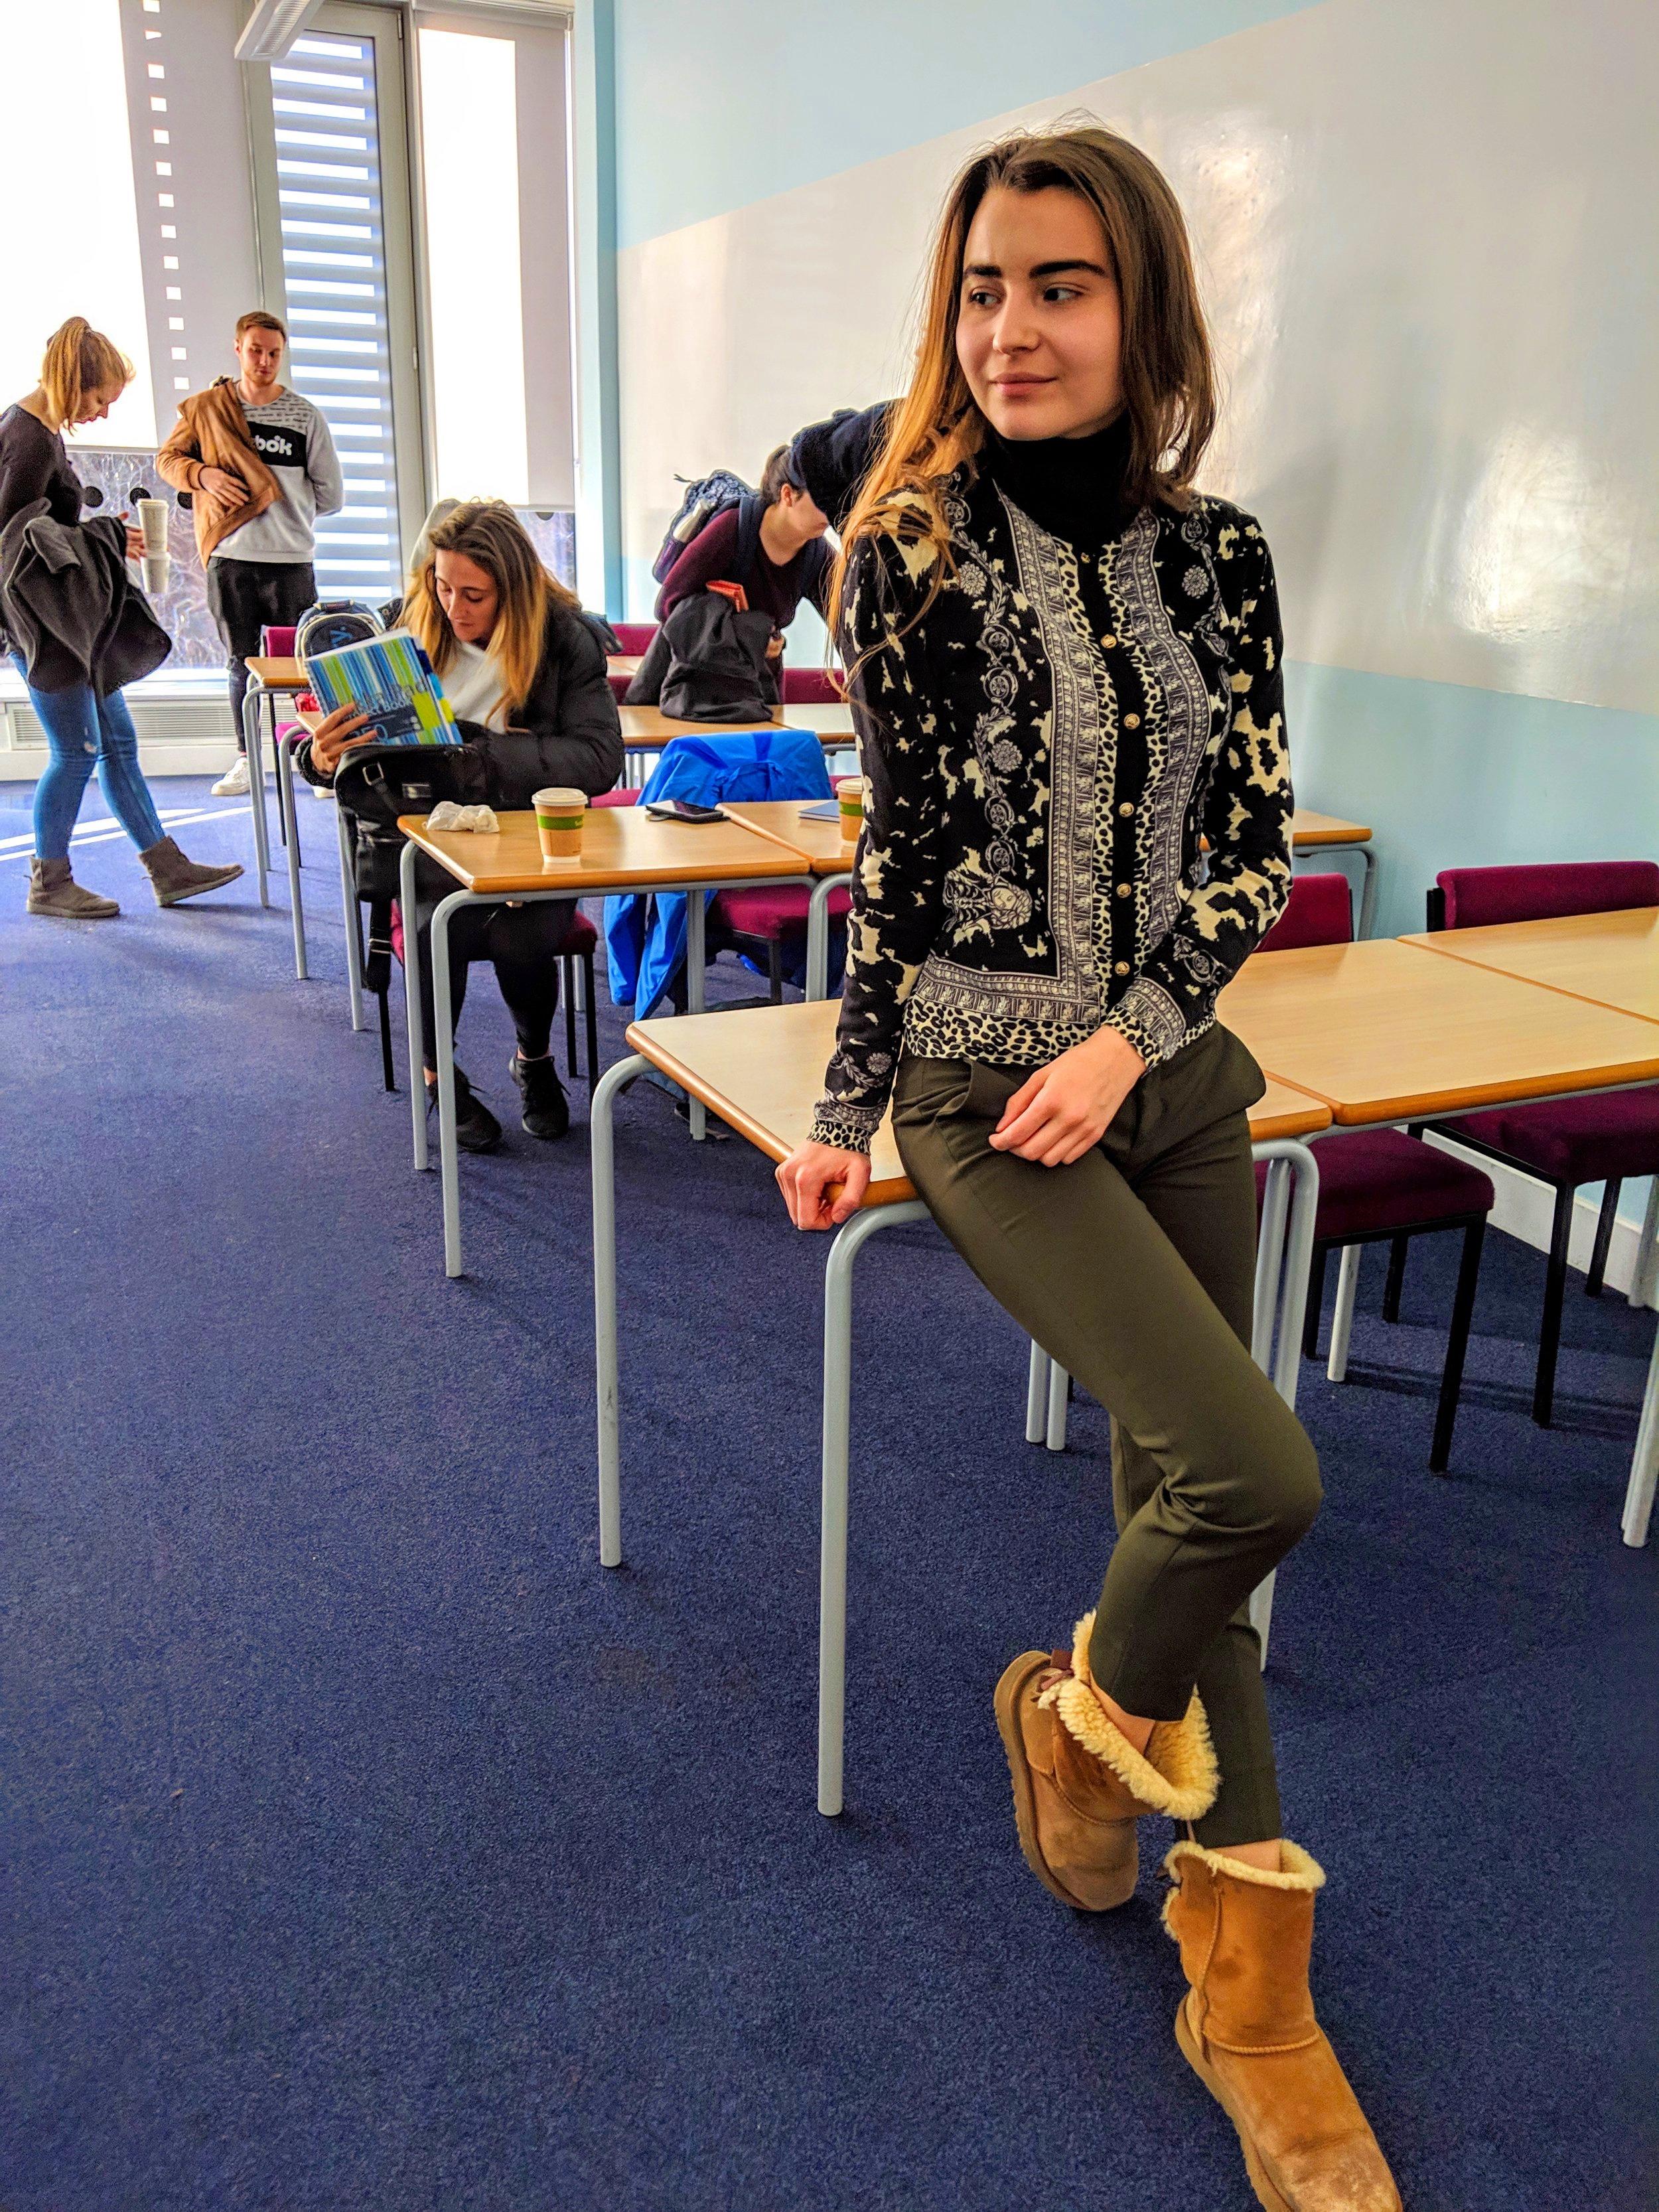 Classroom's Size